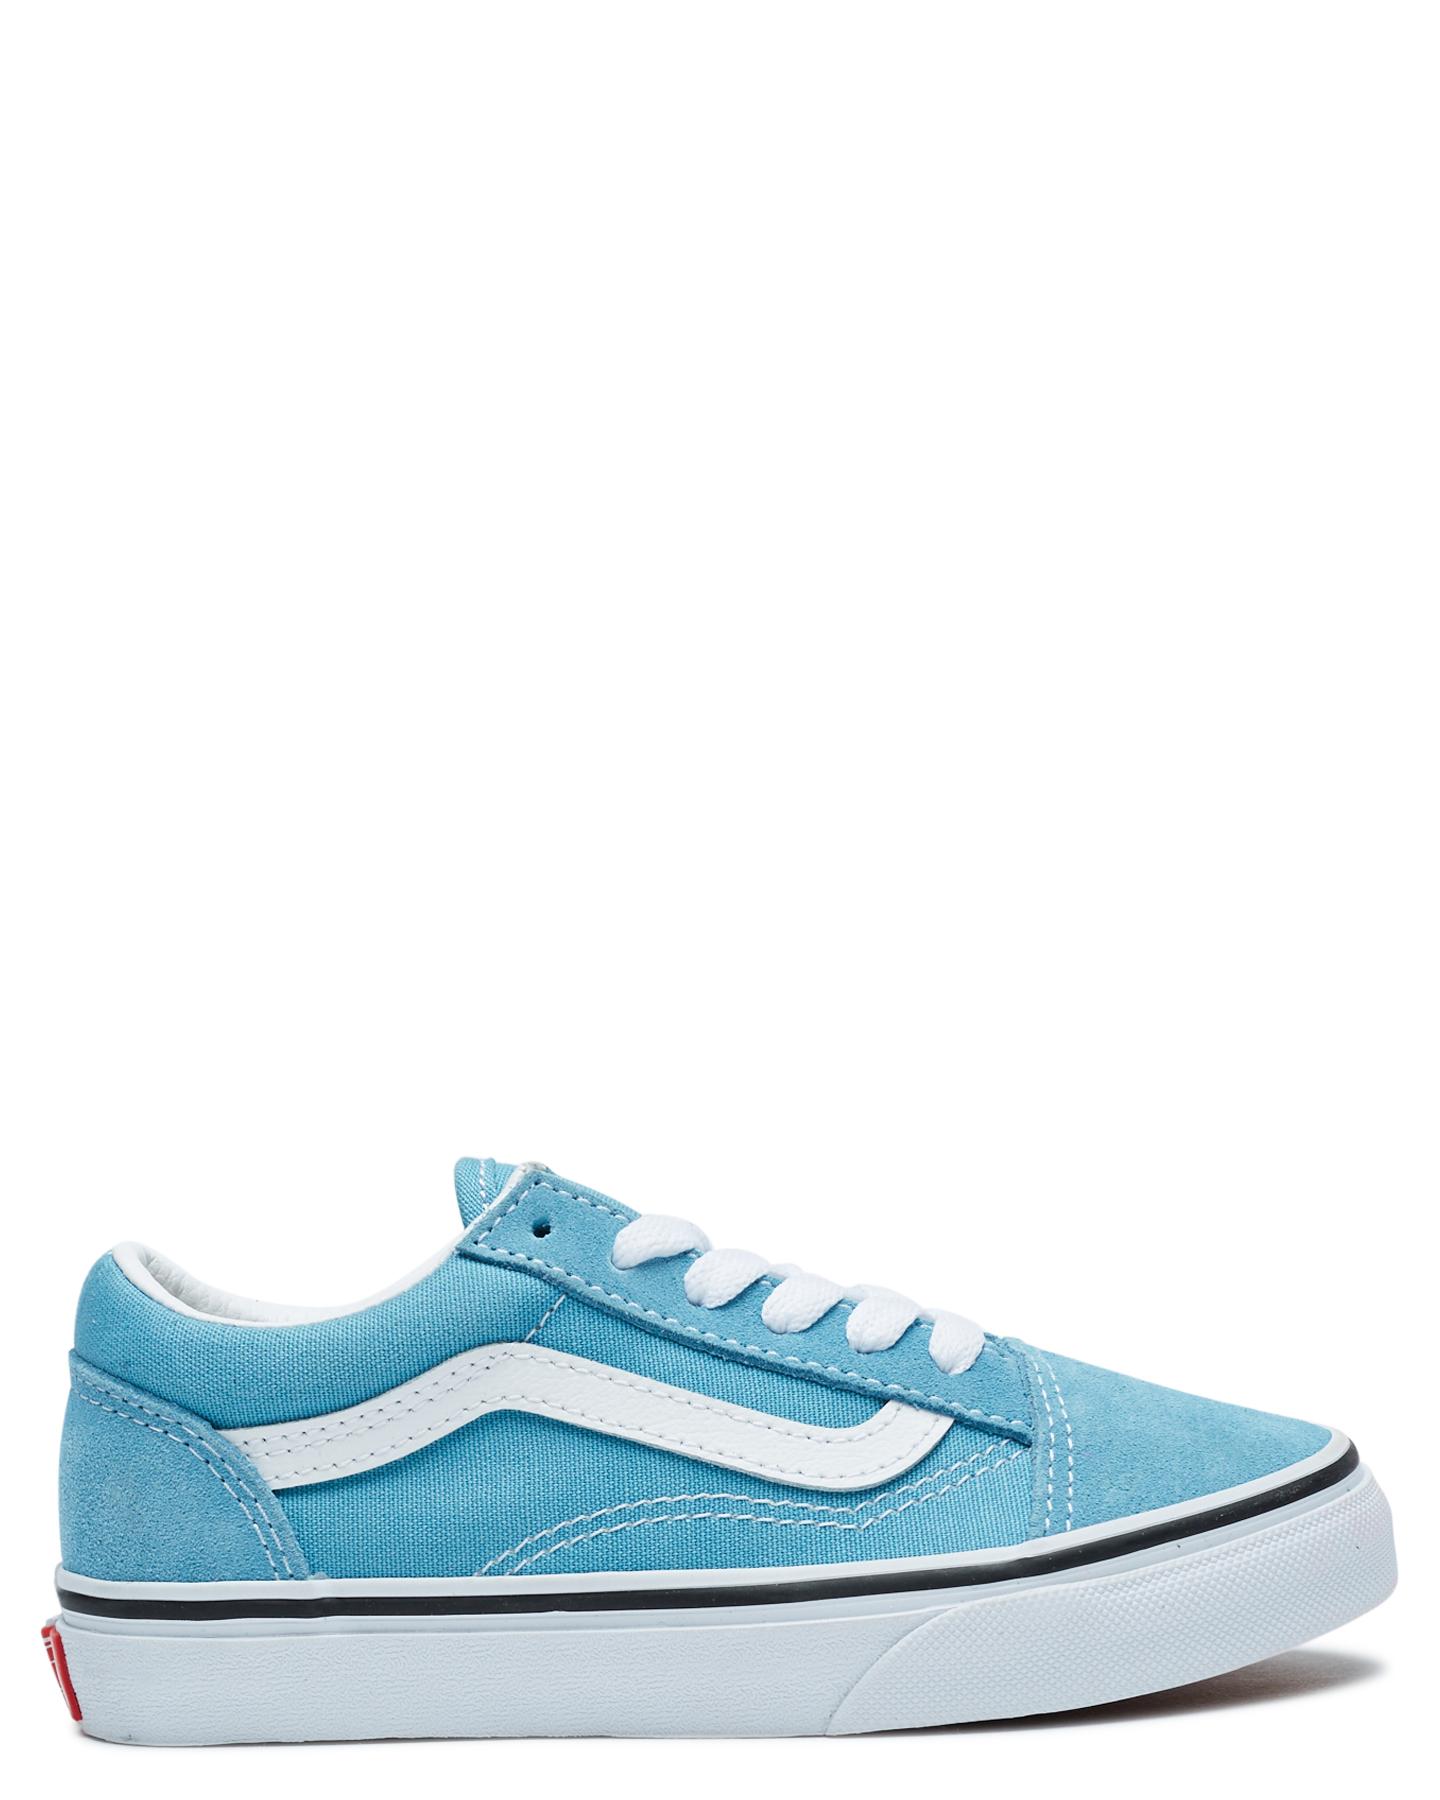 Vans Old Skool Shoe - Youth Blue  White